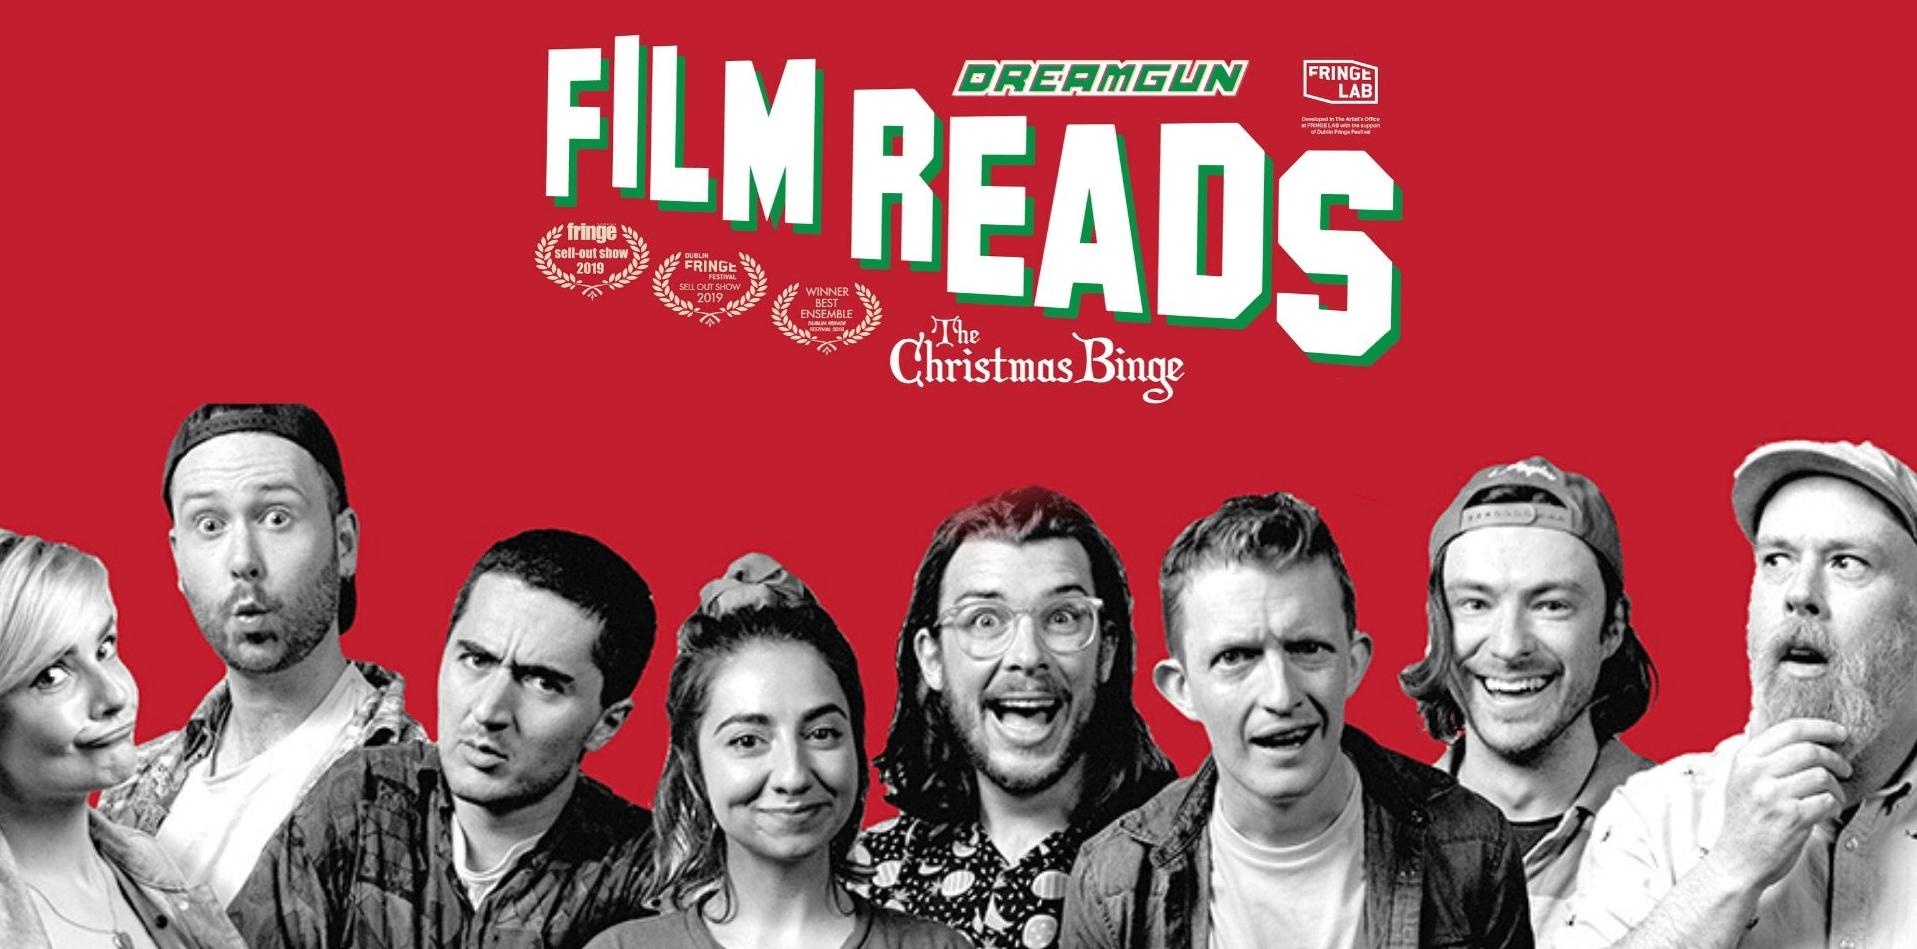 Dreamgun Film Reads : The Christmas Binge